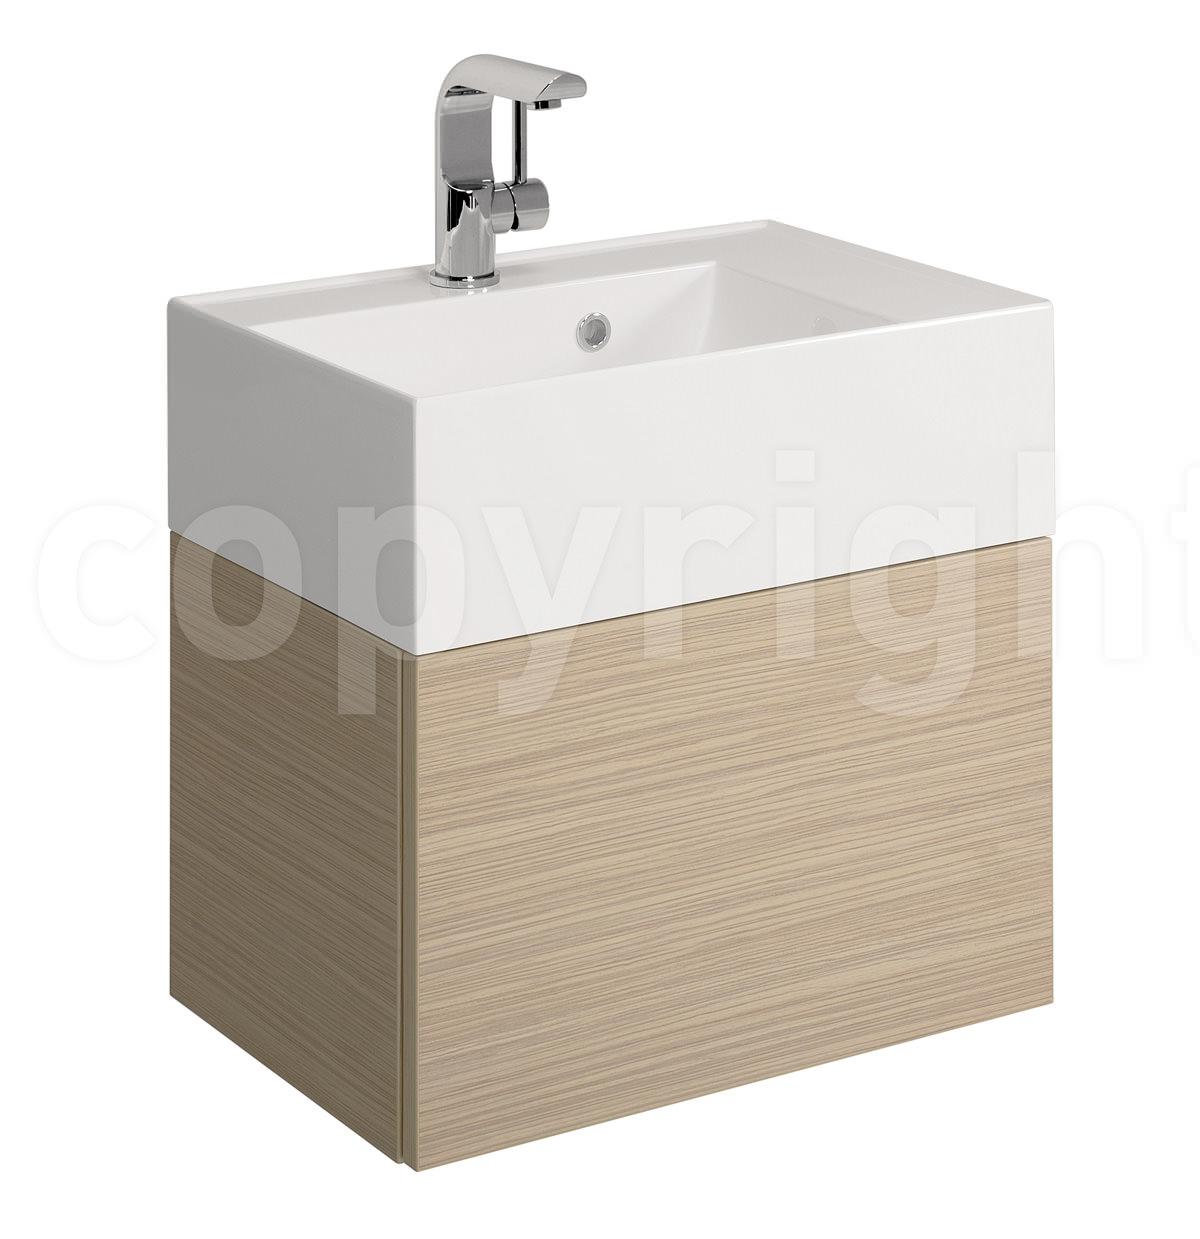 Bauhaus Elite 500mm Square Vanity Basin With Overflow